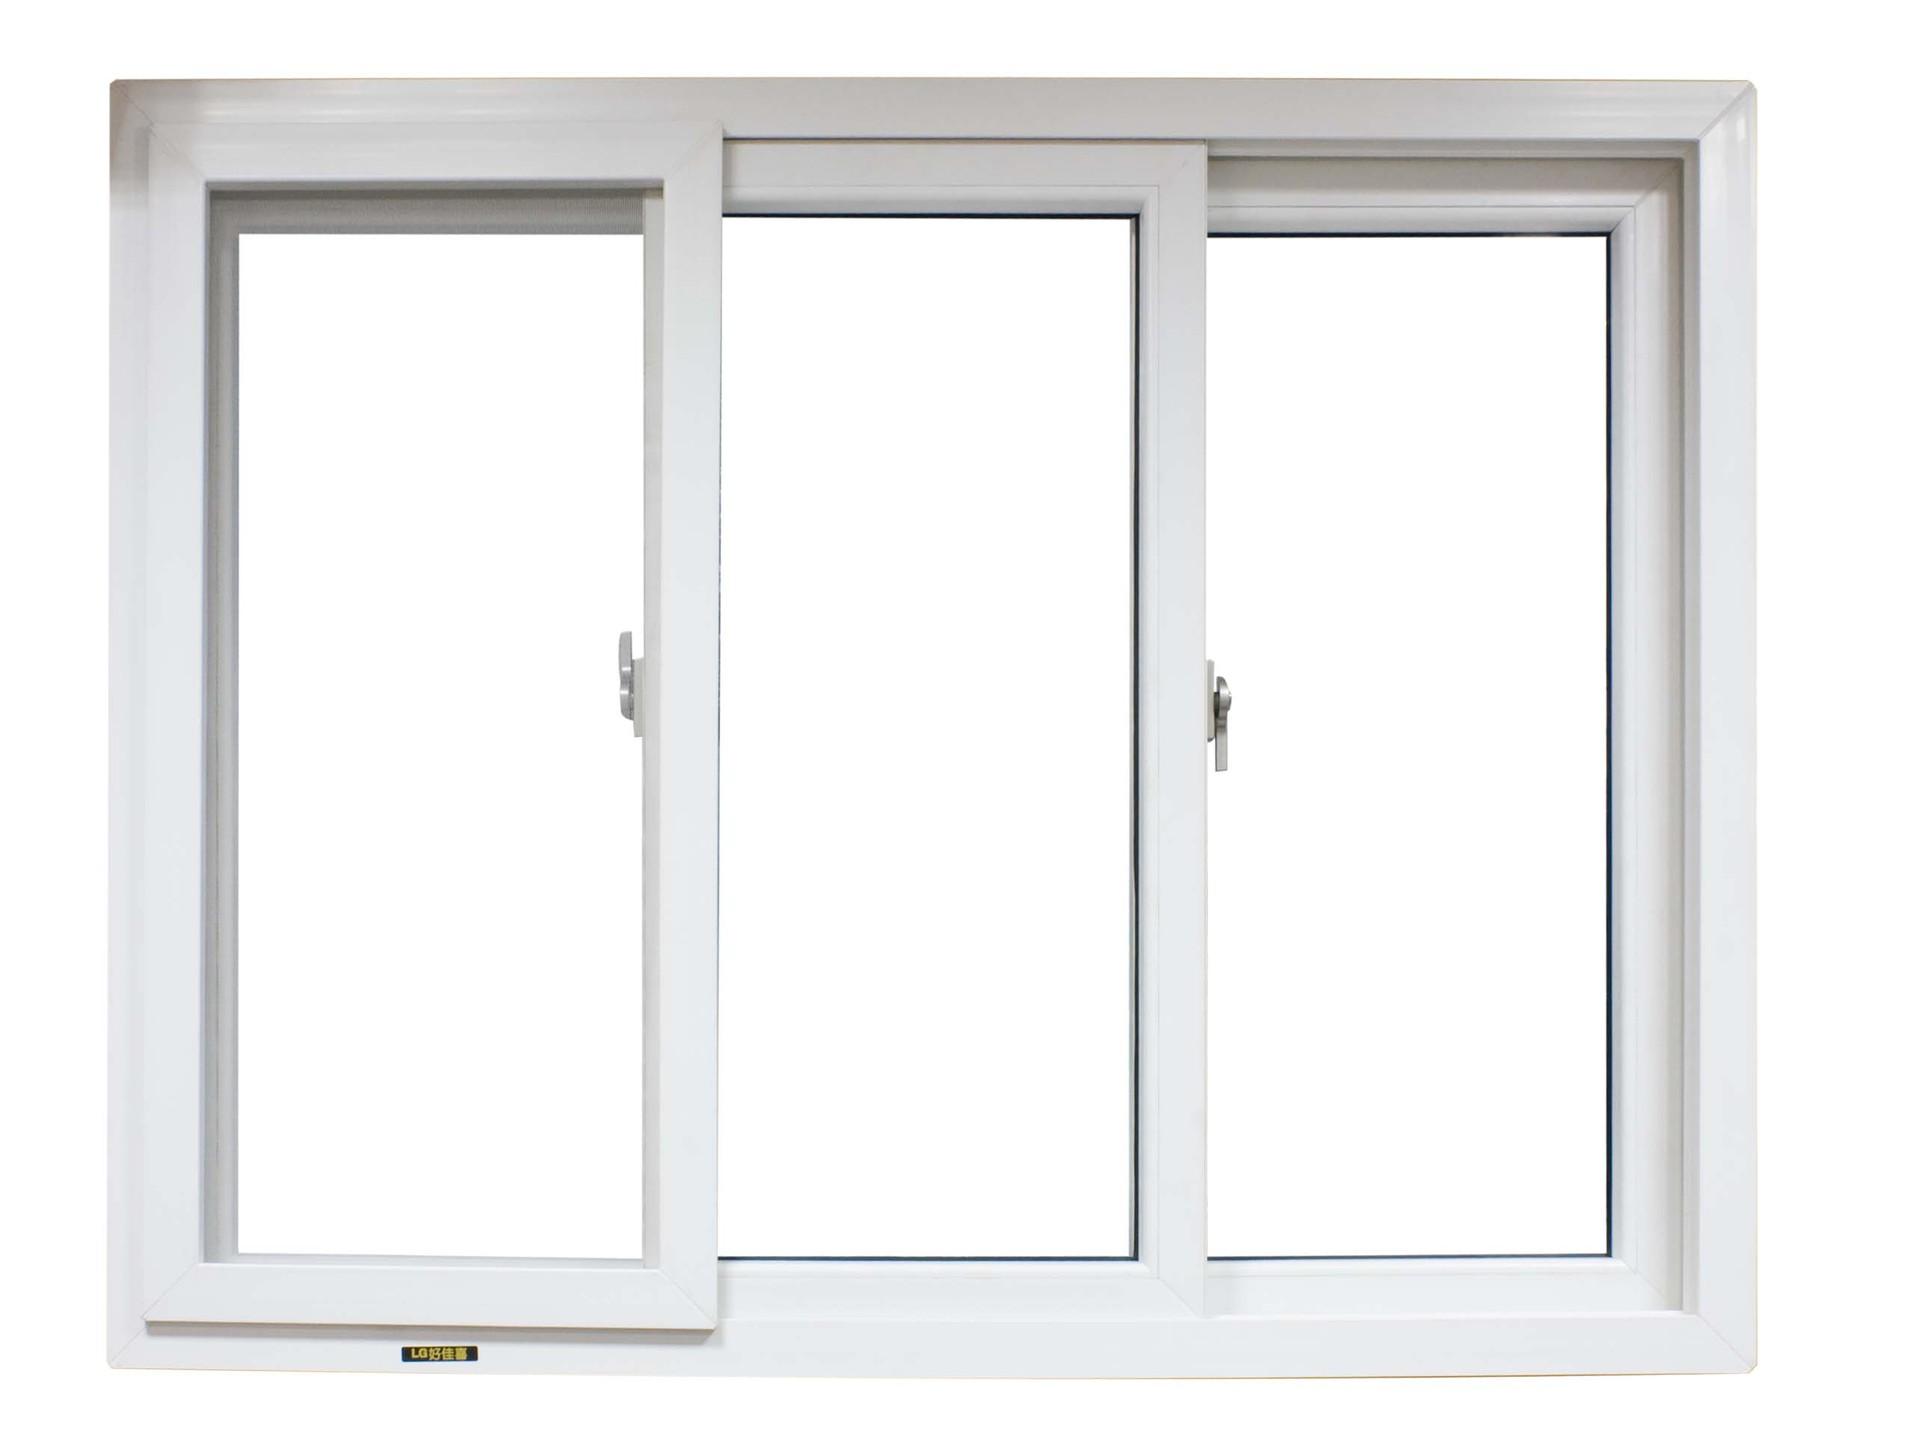 latest style high quality upvc sliding windows for living room